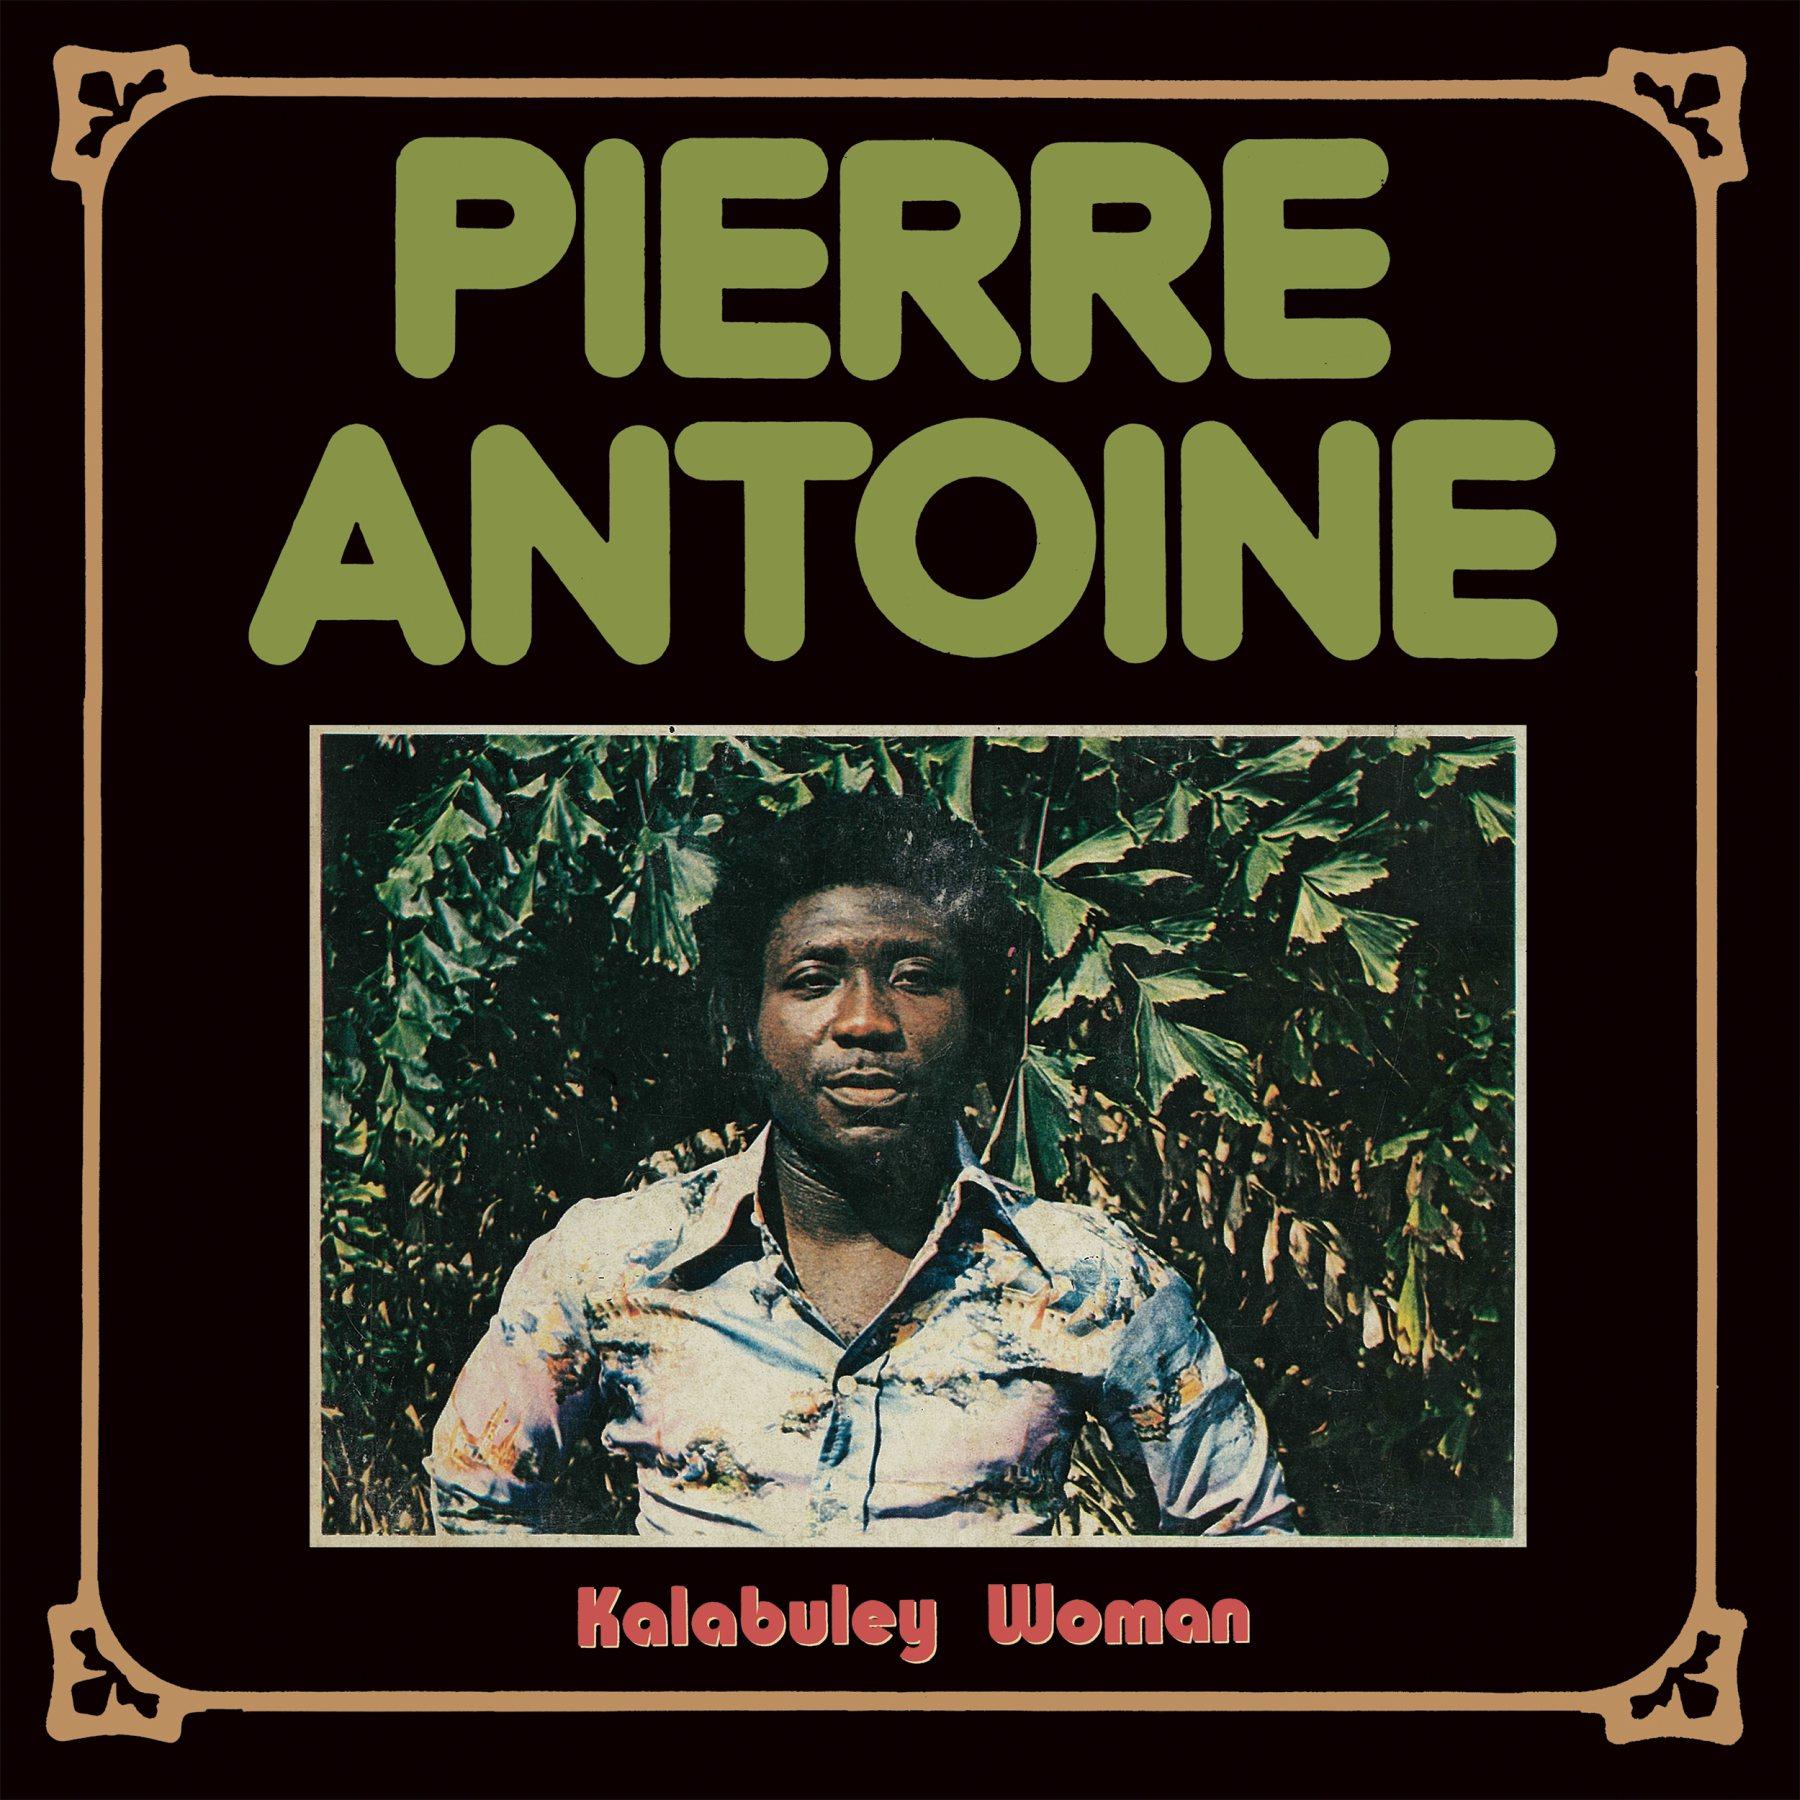 Pierre Antoine 1